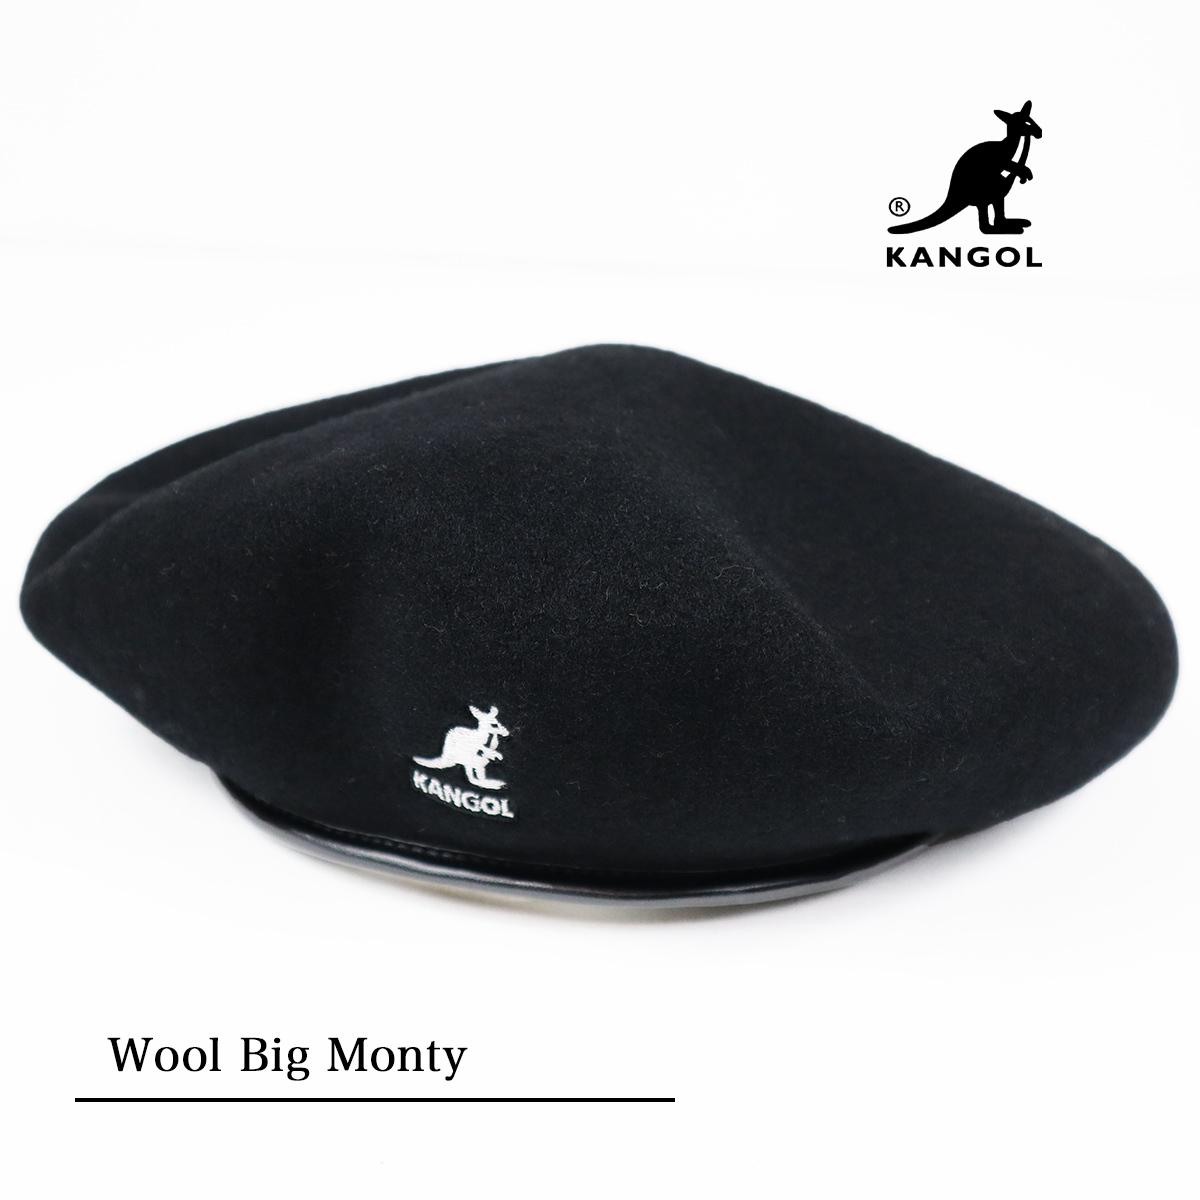 KANGOL カンゴール 日本限定デザインウールベレー帽 ビッグ Big 出色 Monty198-169503 Wool 再入荷/予約販売! モンティSMU